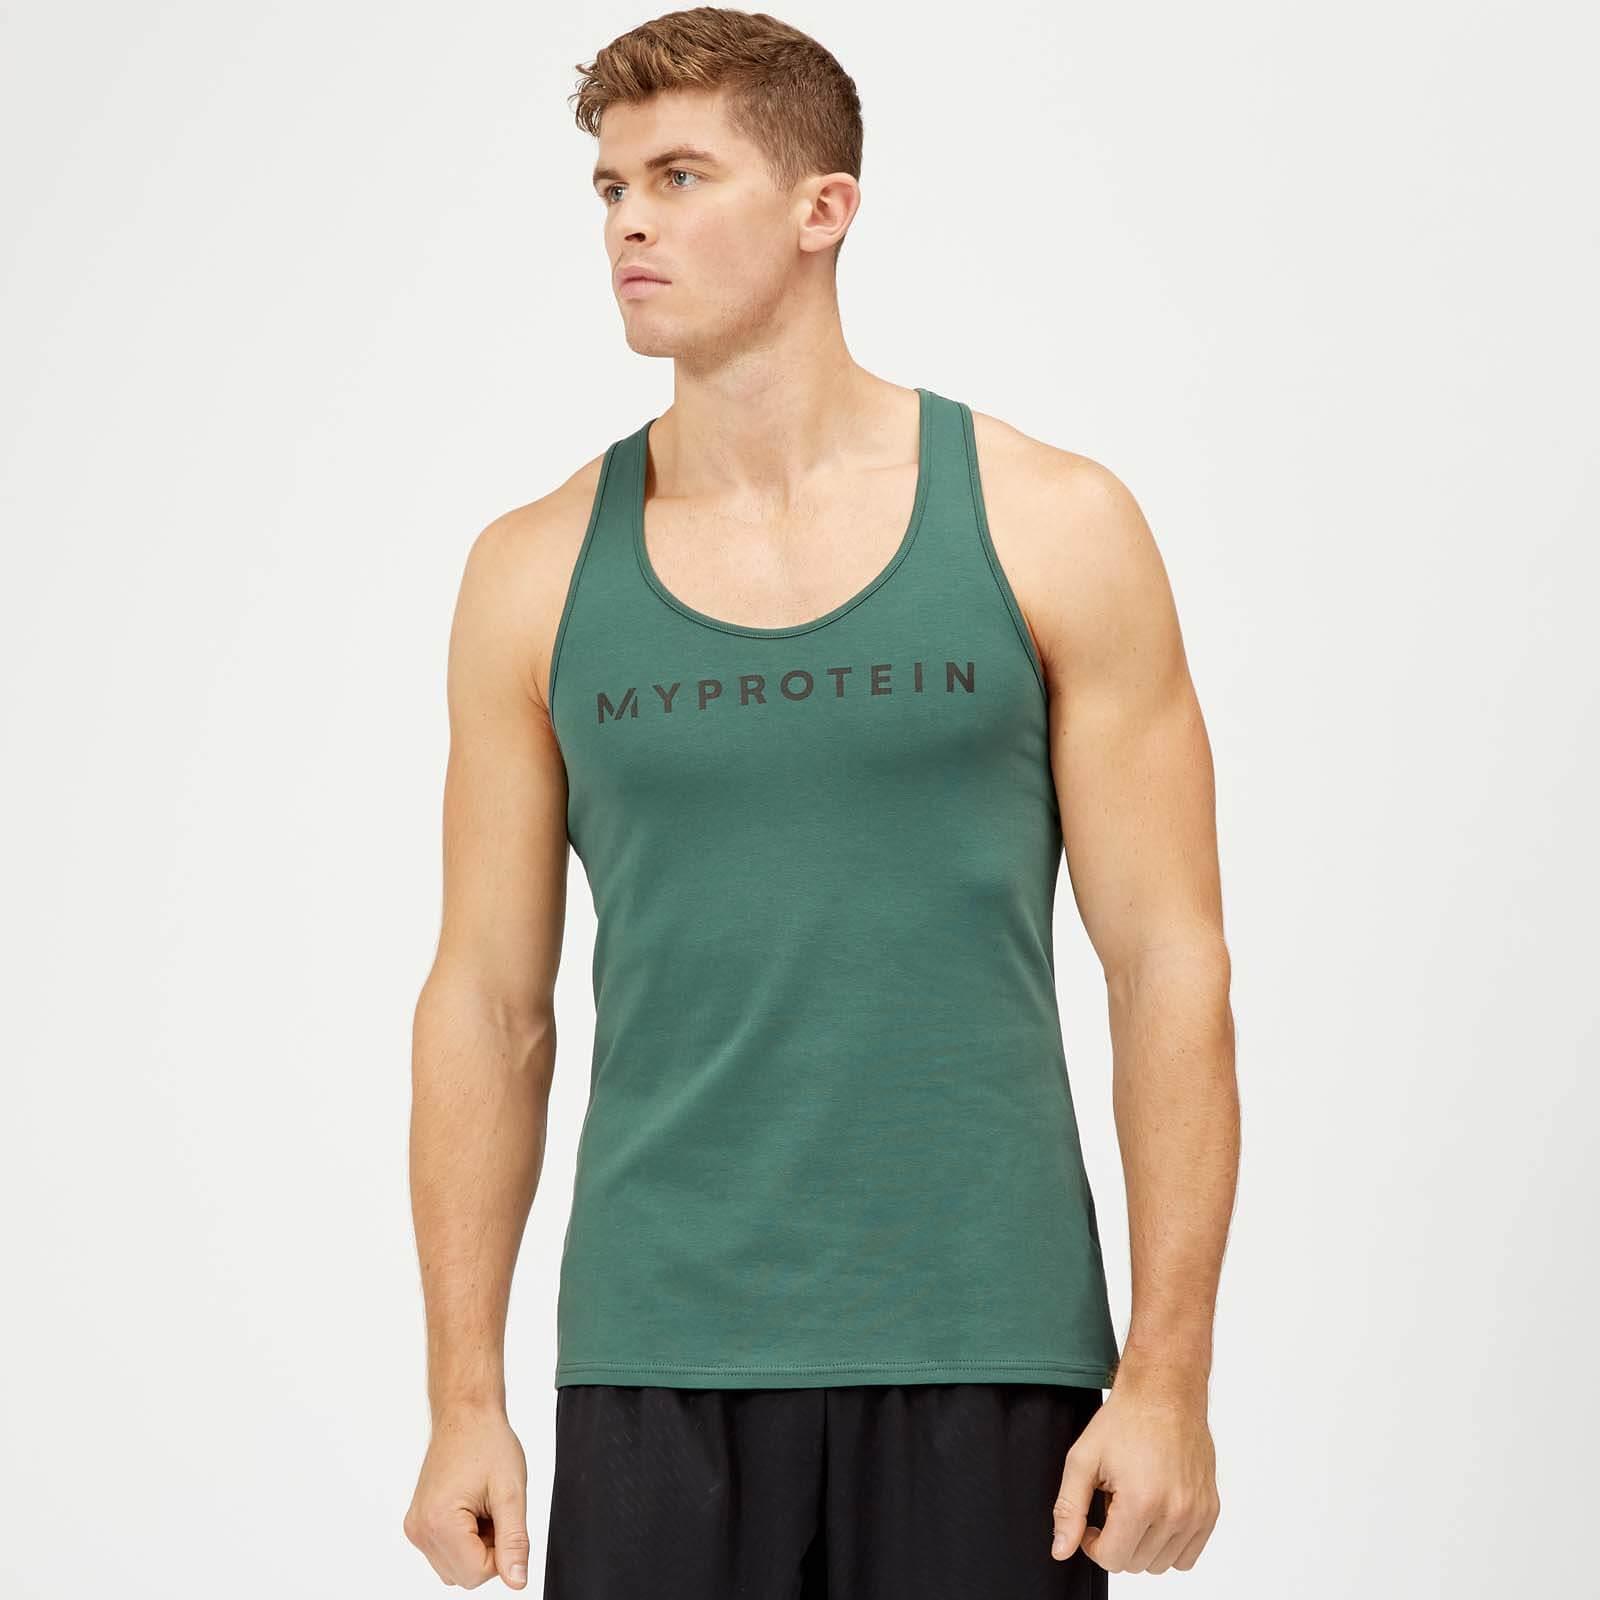 99c0884d70da9 ... Camiseta de Tirantes Larga Logo - S - Pine